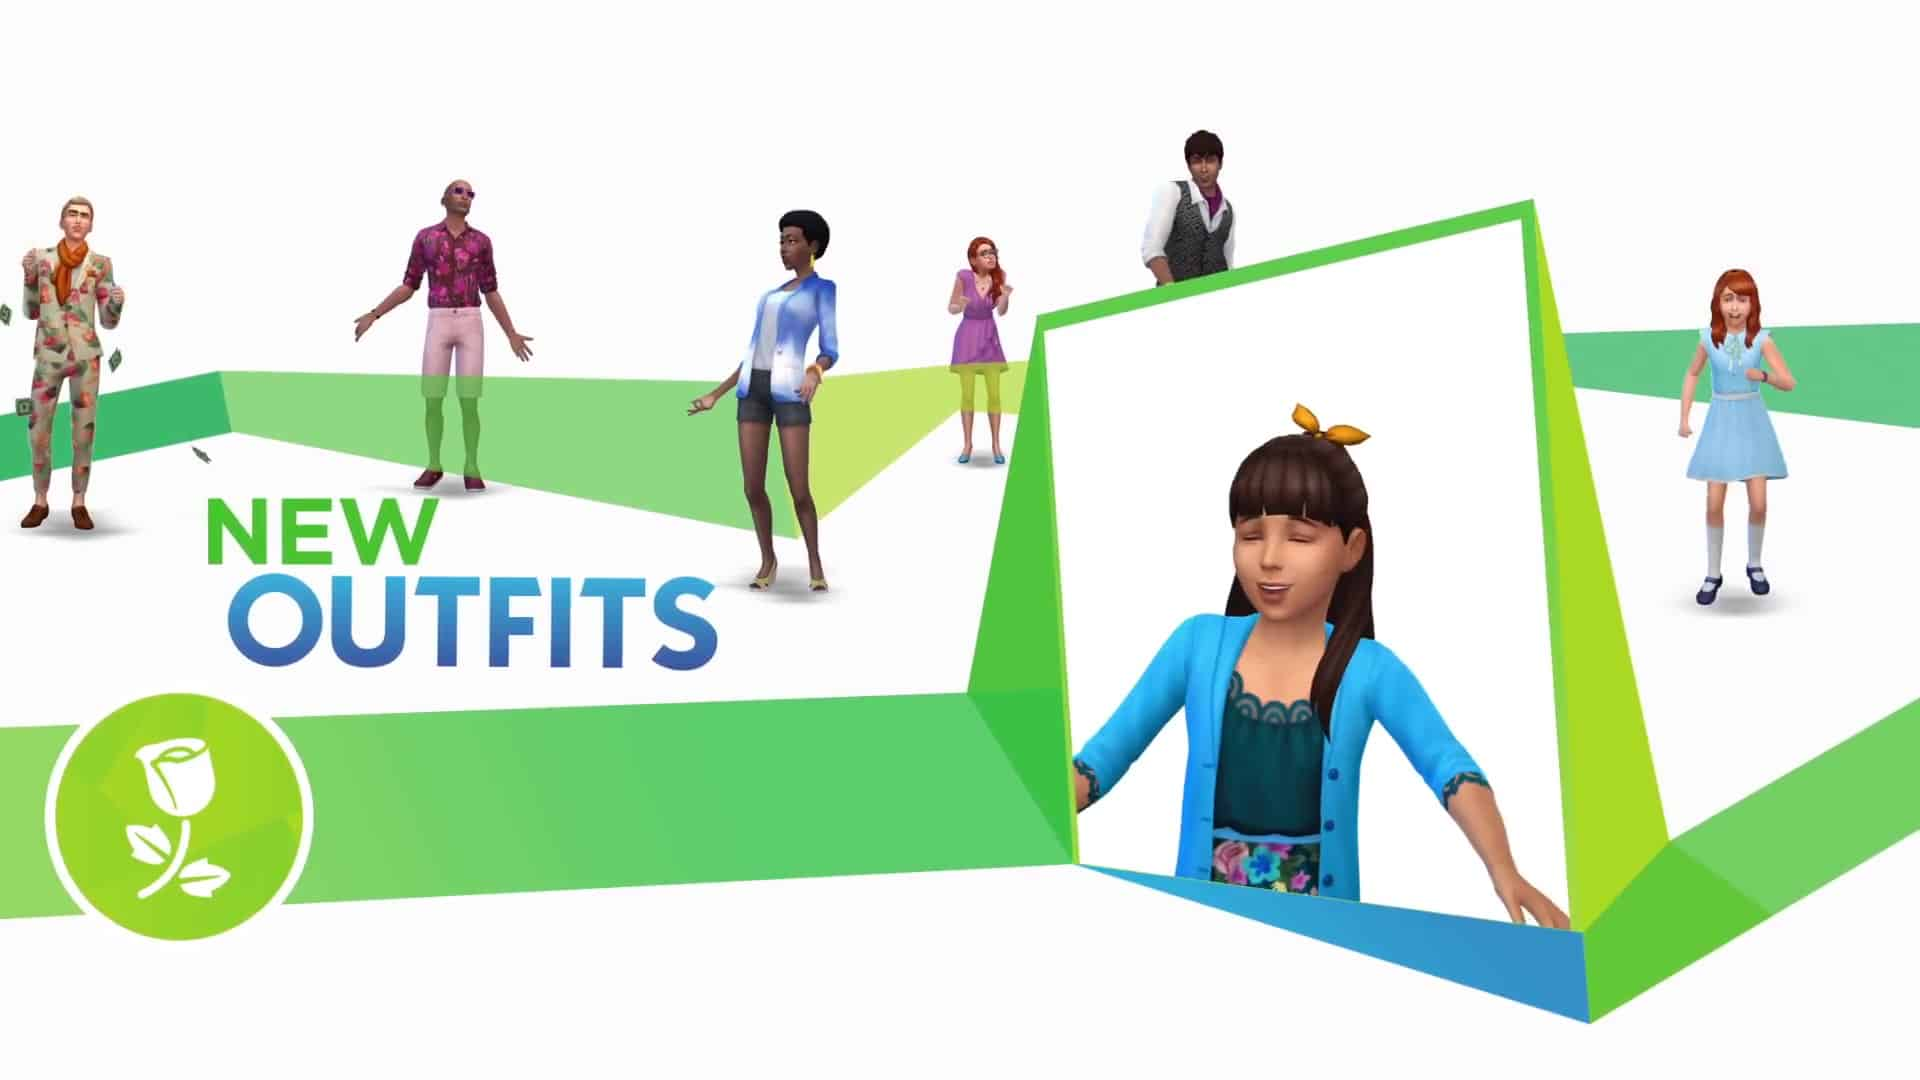 The Sims 4 Romantic Garden Stuff_ Official Trailer 131 - Sims Community